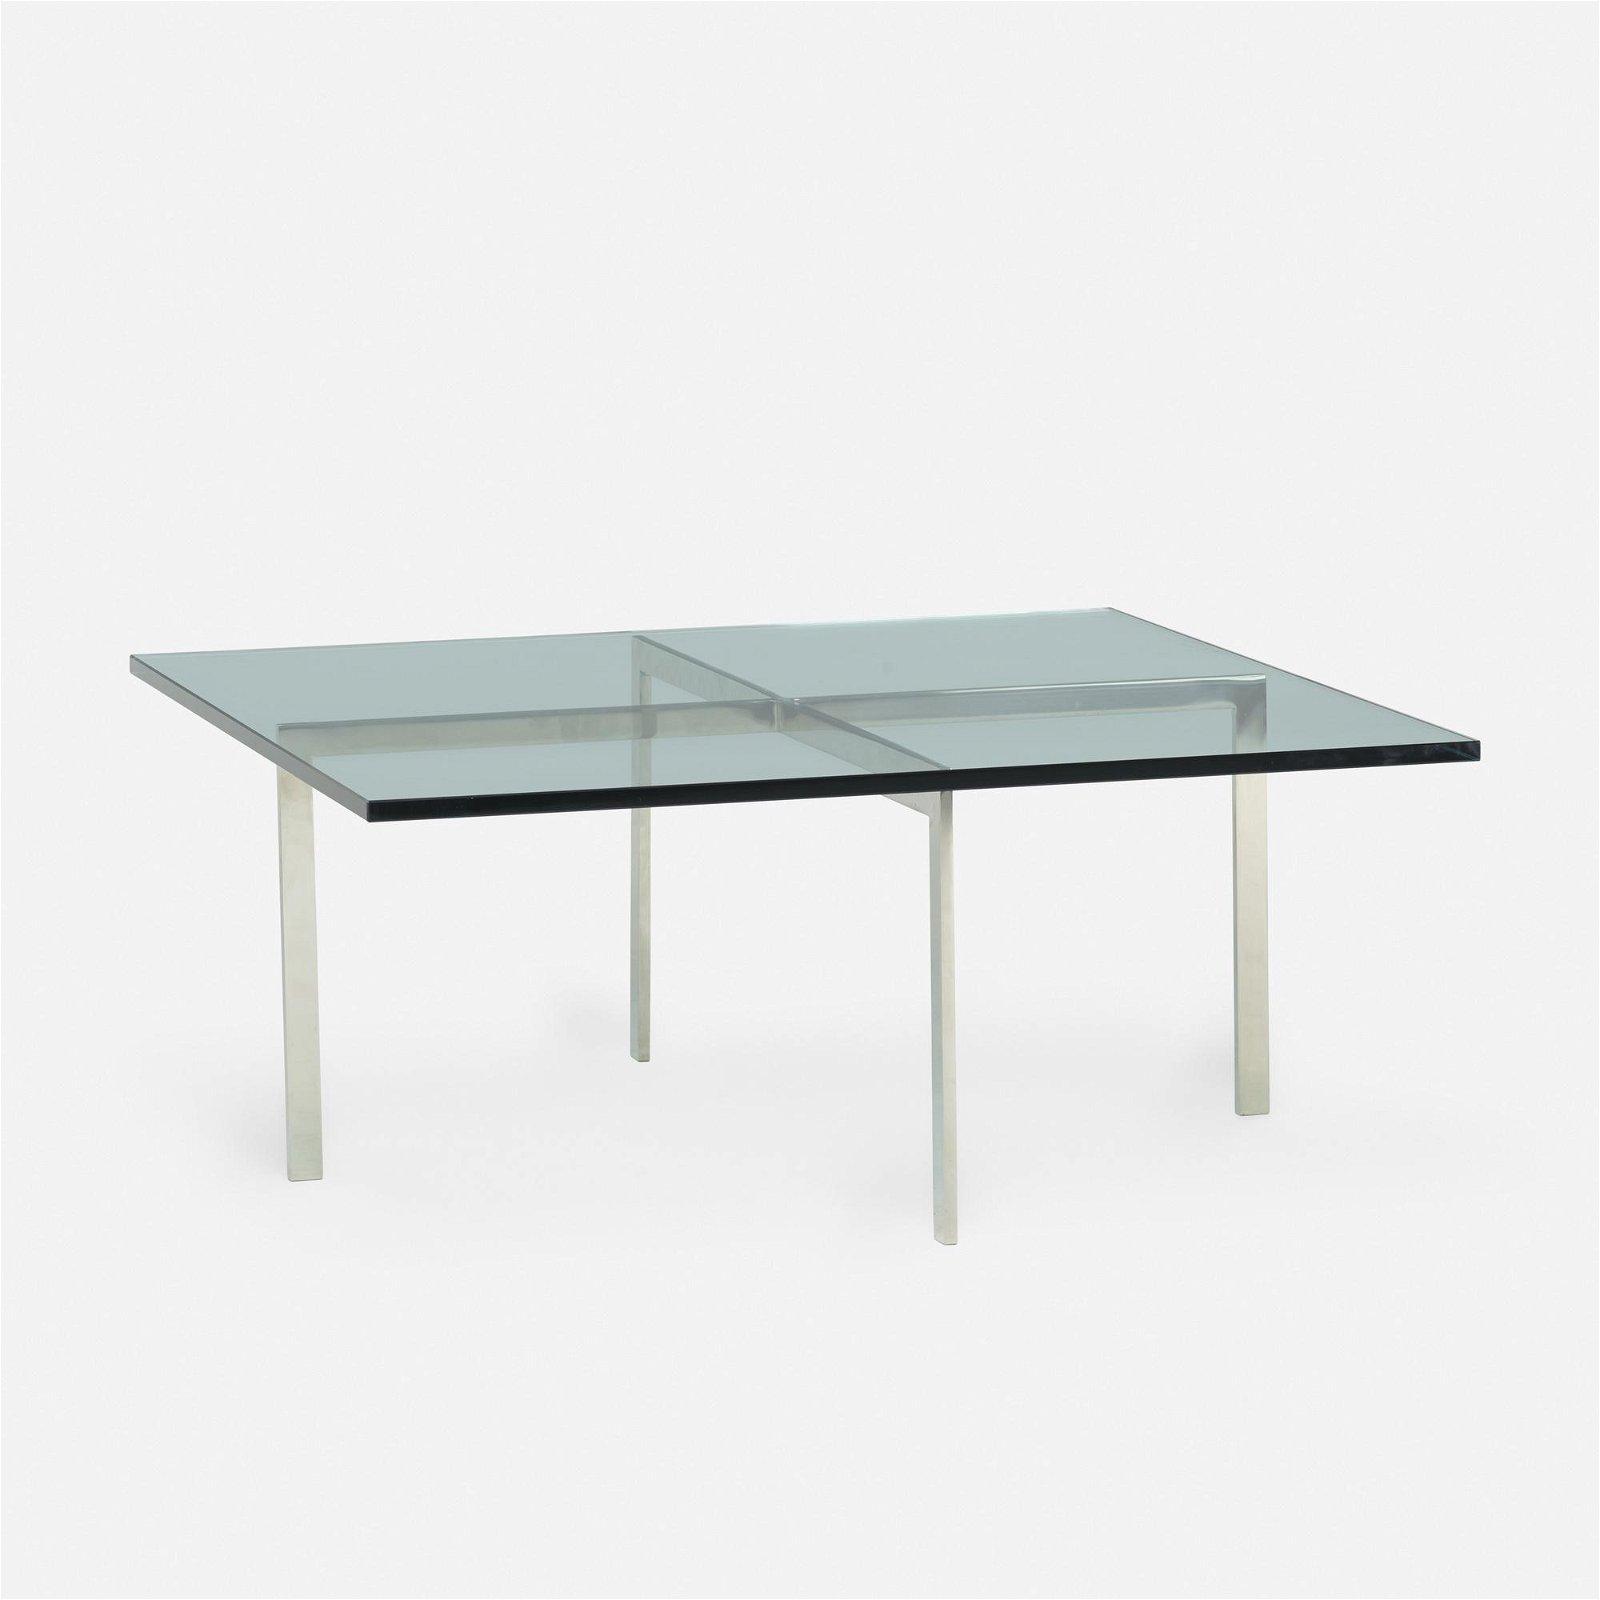 Ludwig Mies van der Rohe, Barcelona coffee table